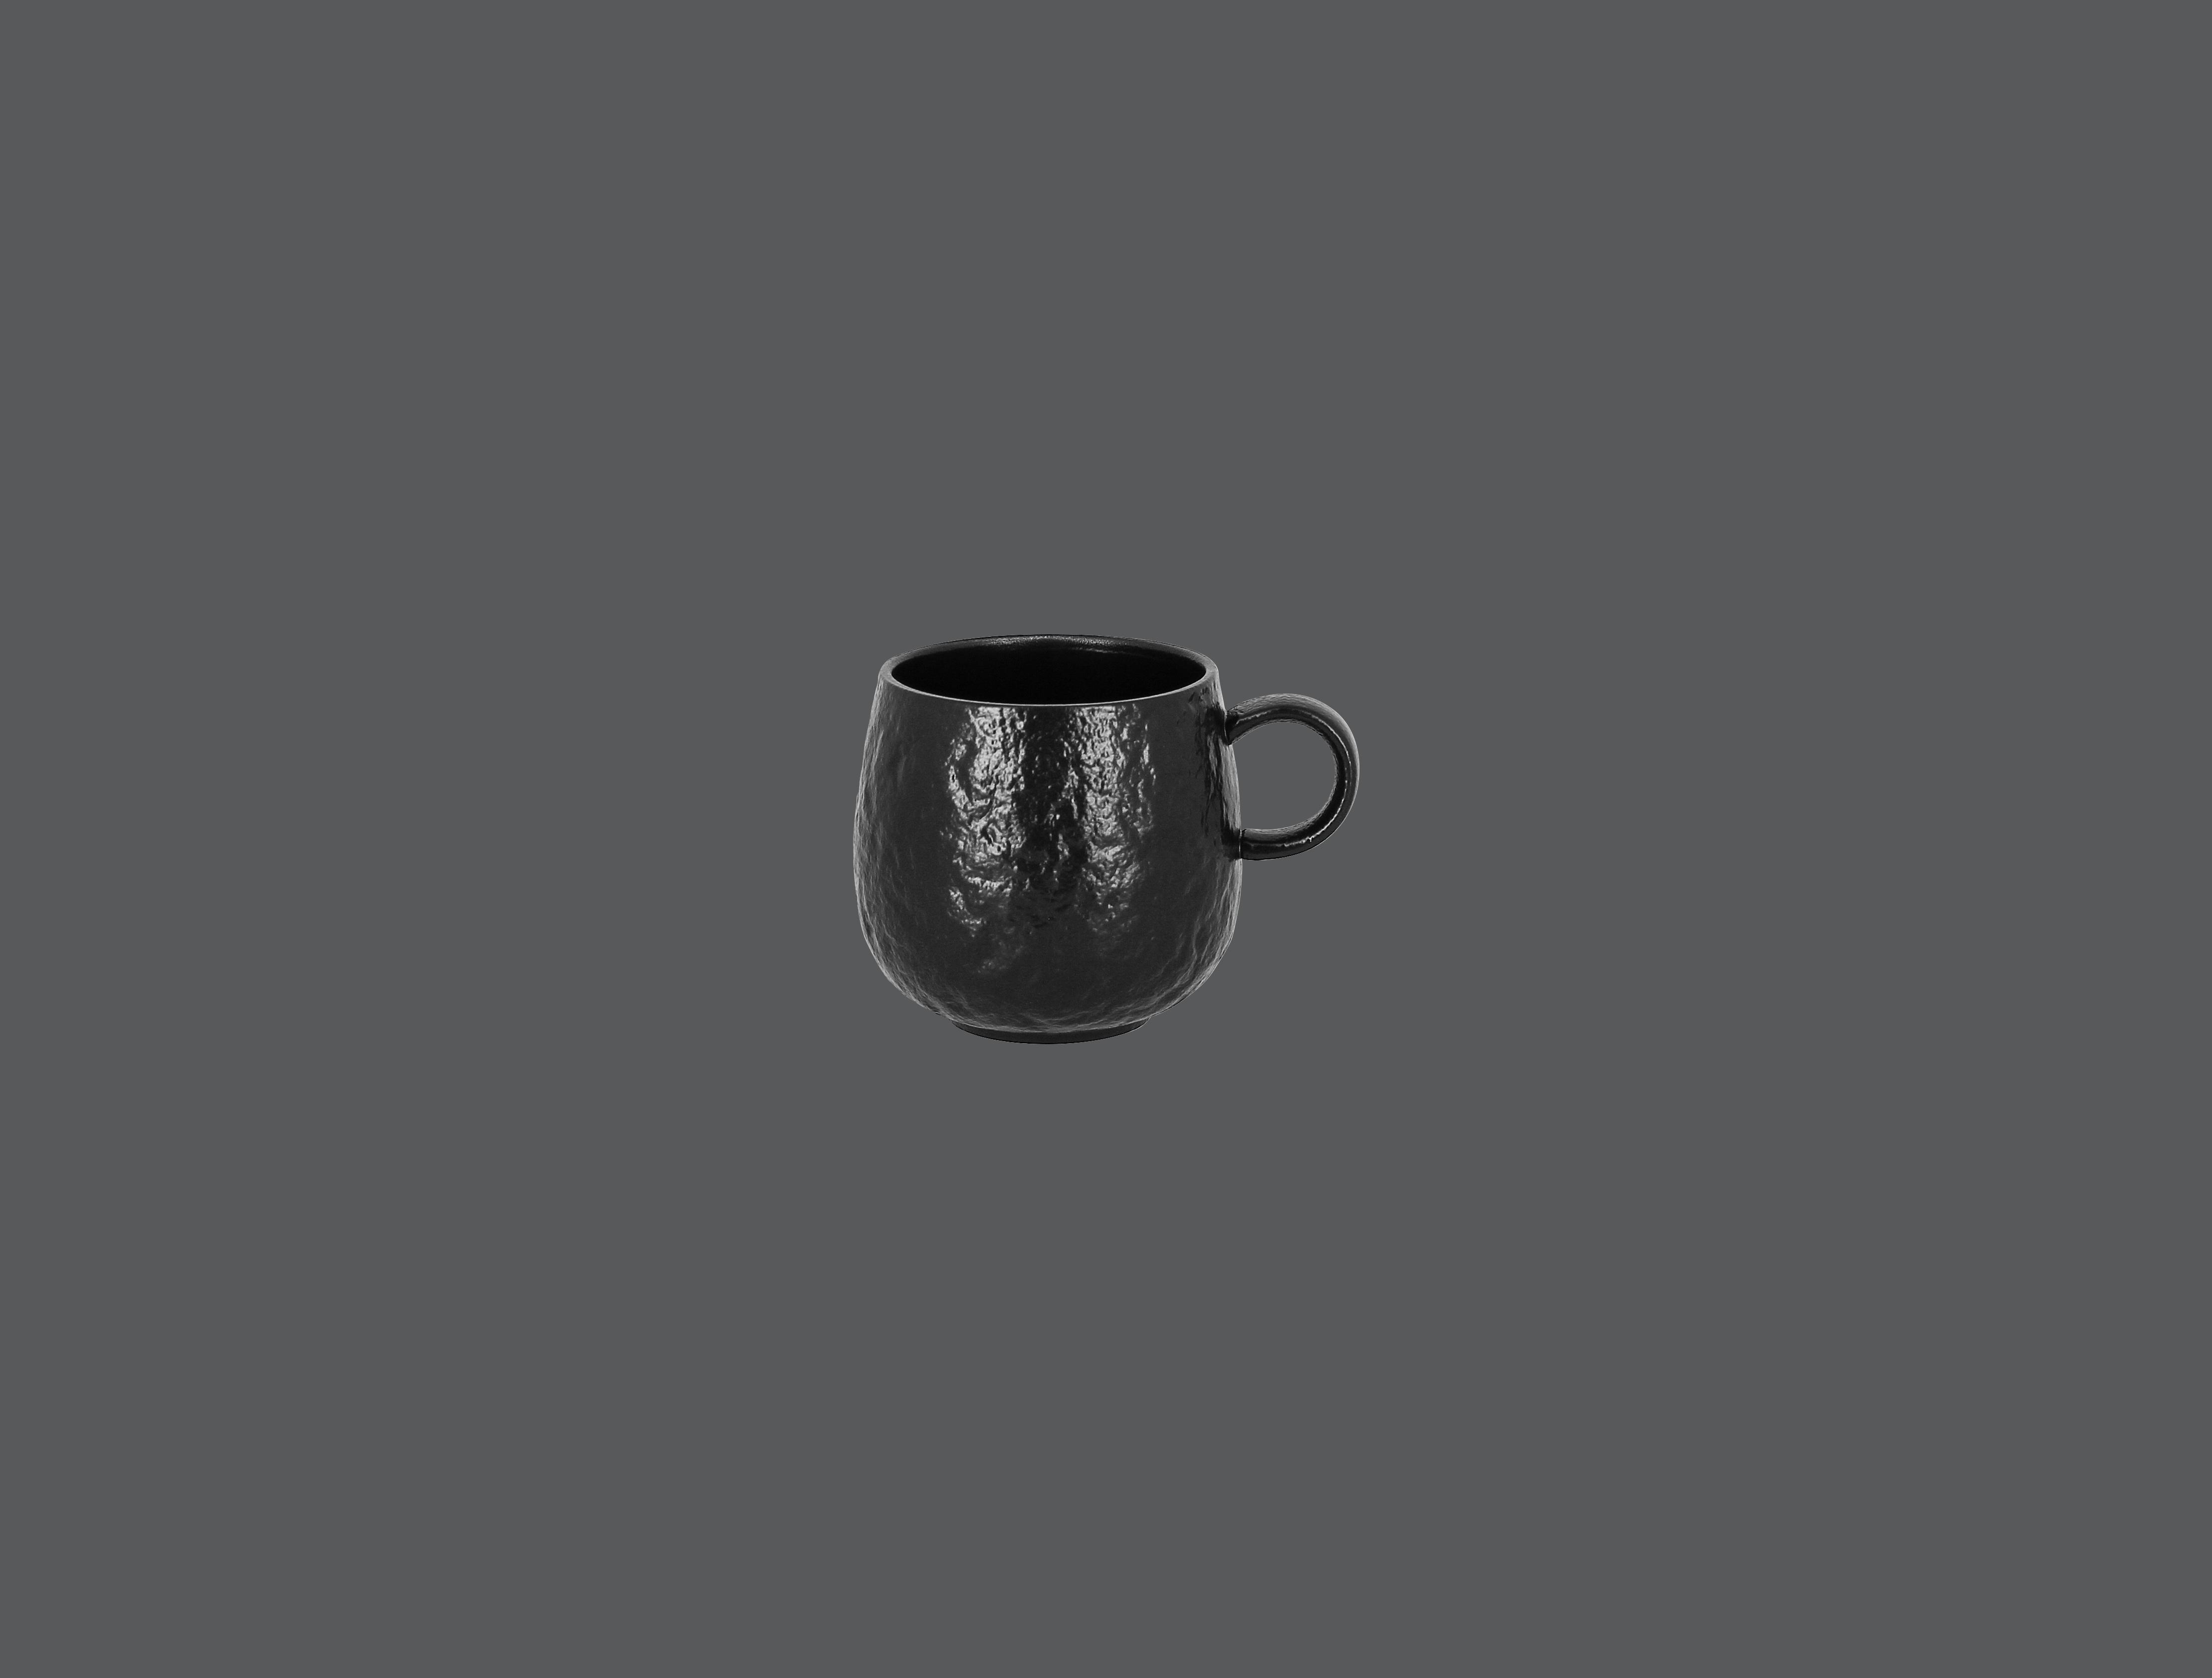 Šálek 33 cl - černá